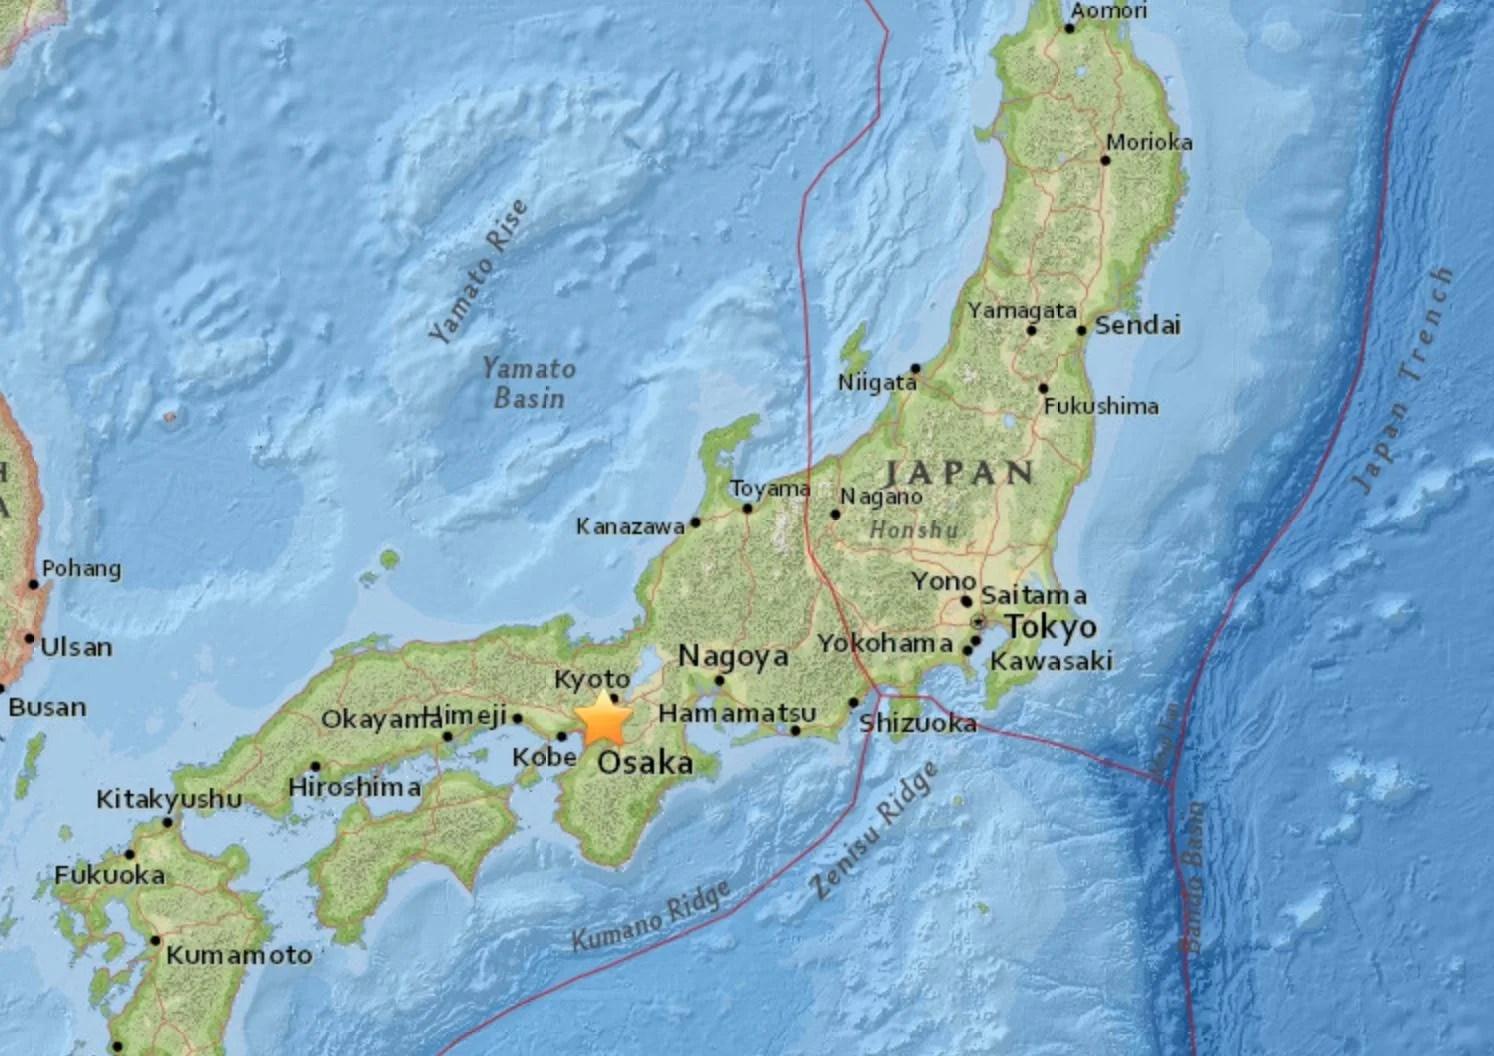 Japan Earthquake At Least Three Dead As 6 1 Magnitude Tremor Hits Osaka